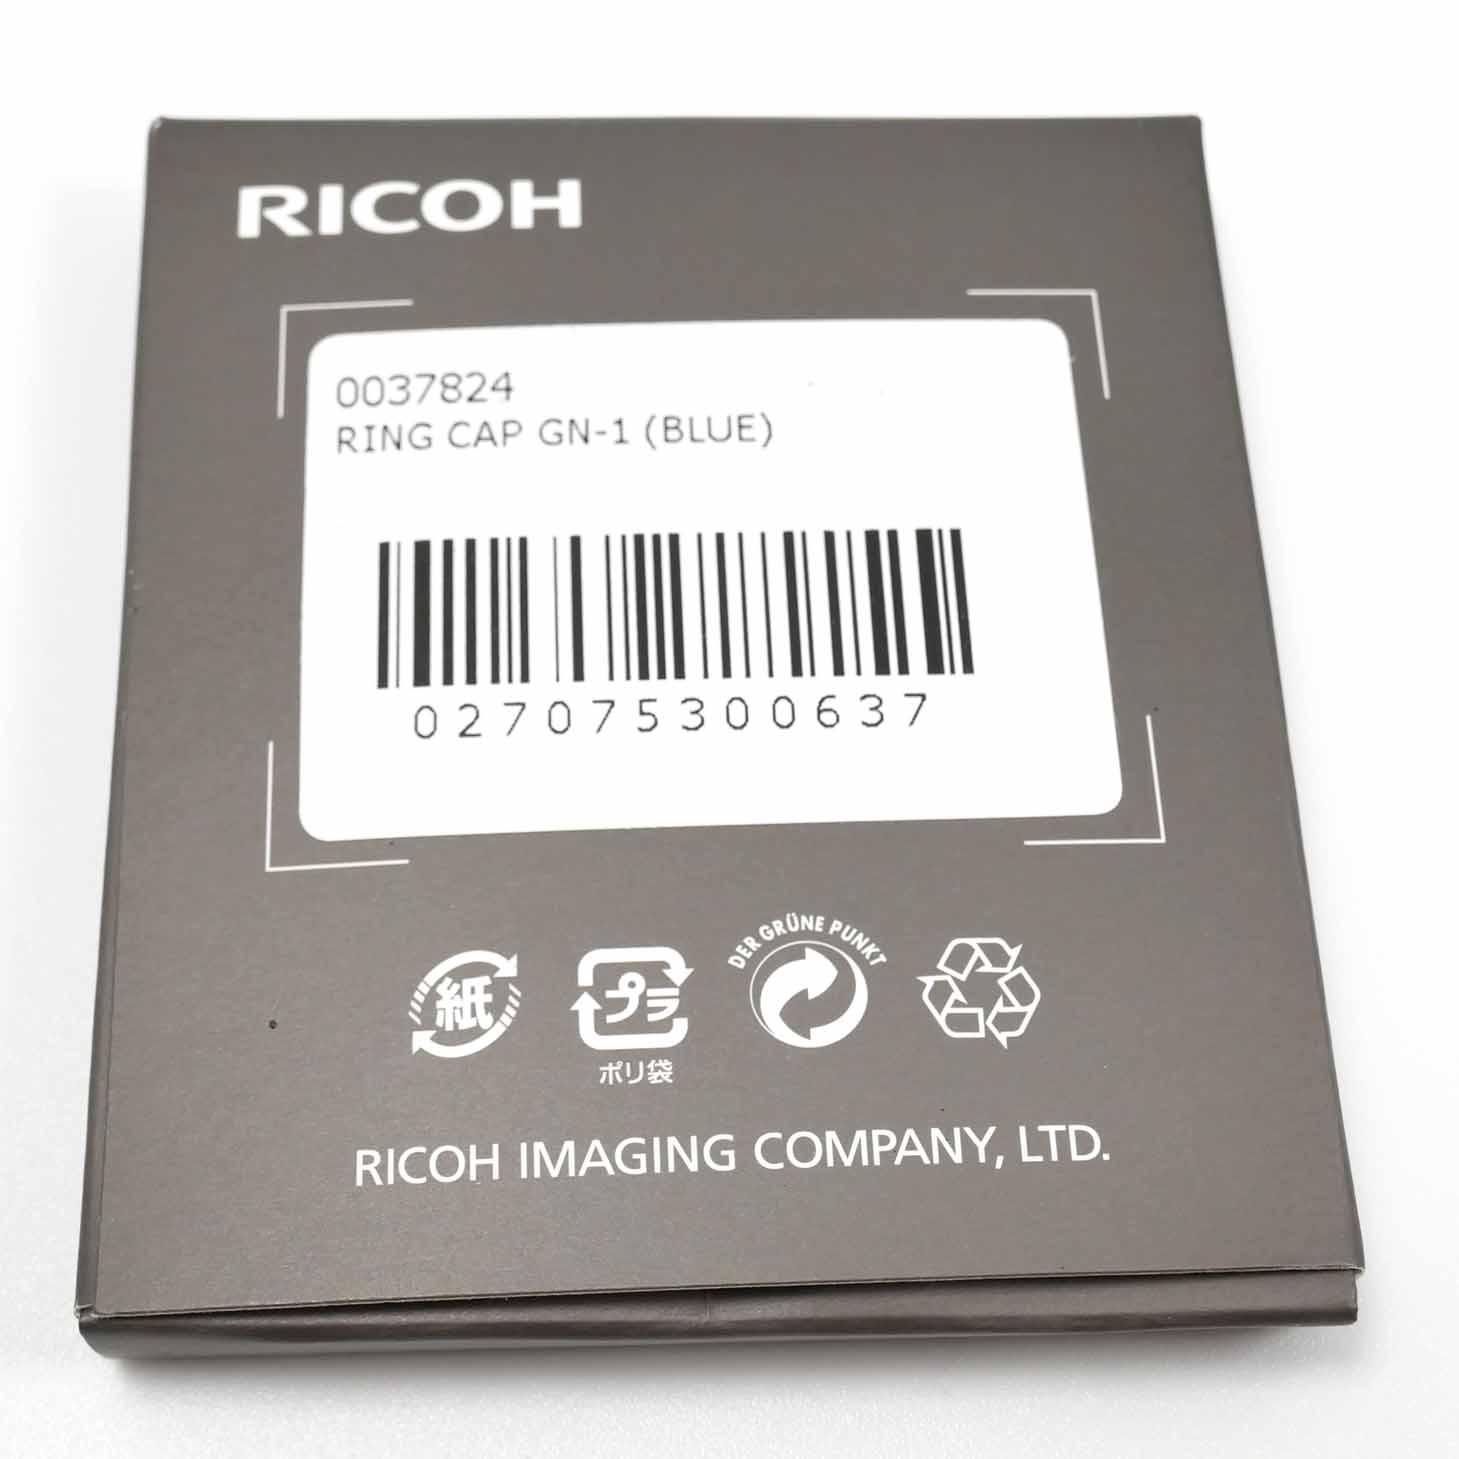 clean-cameras-Ricoh-Ring-Cap-blue-0037824-04